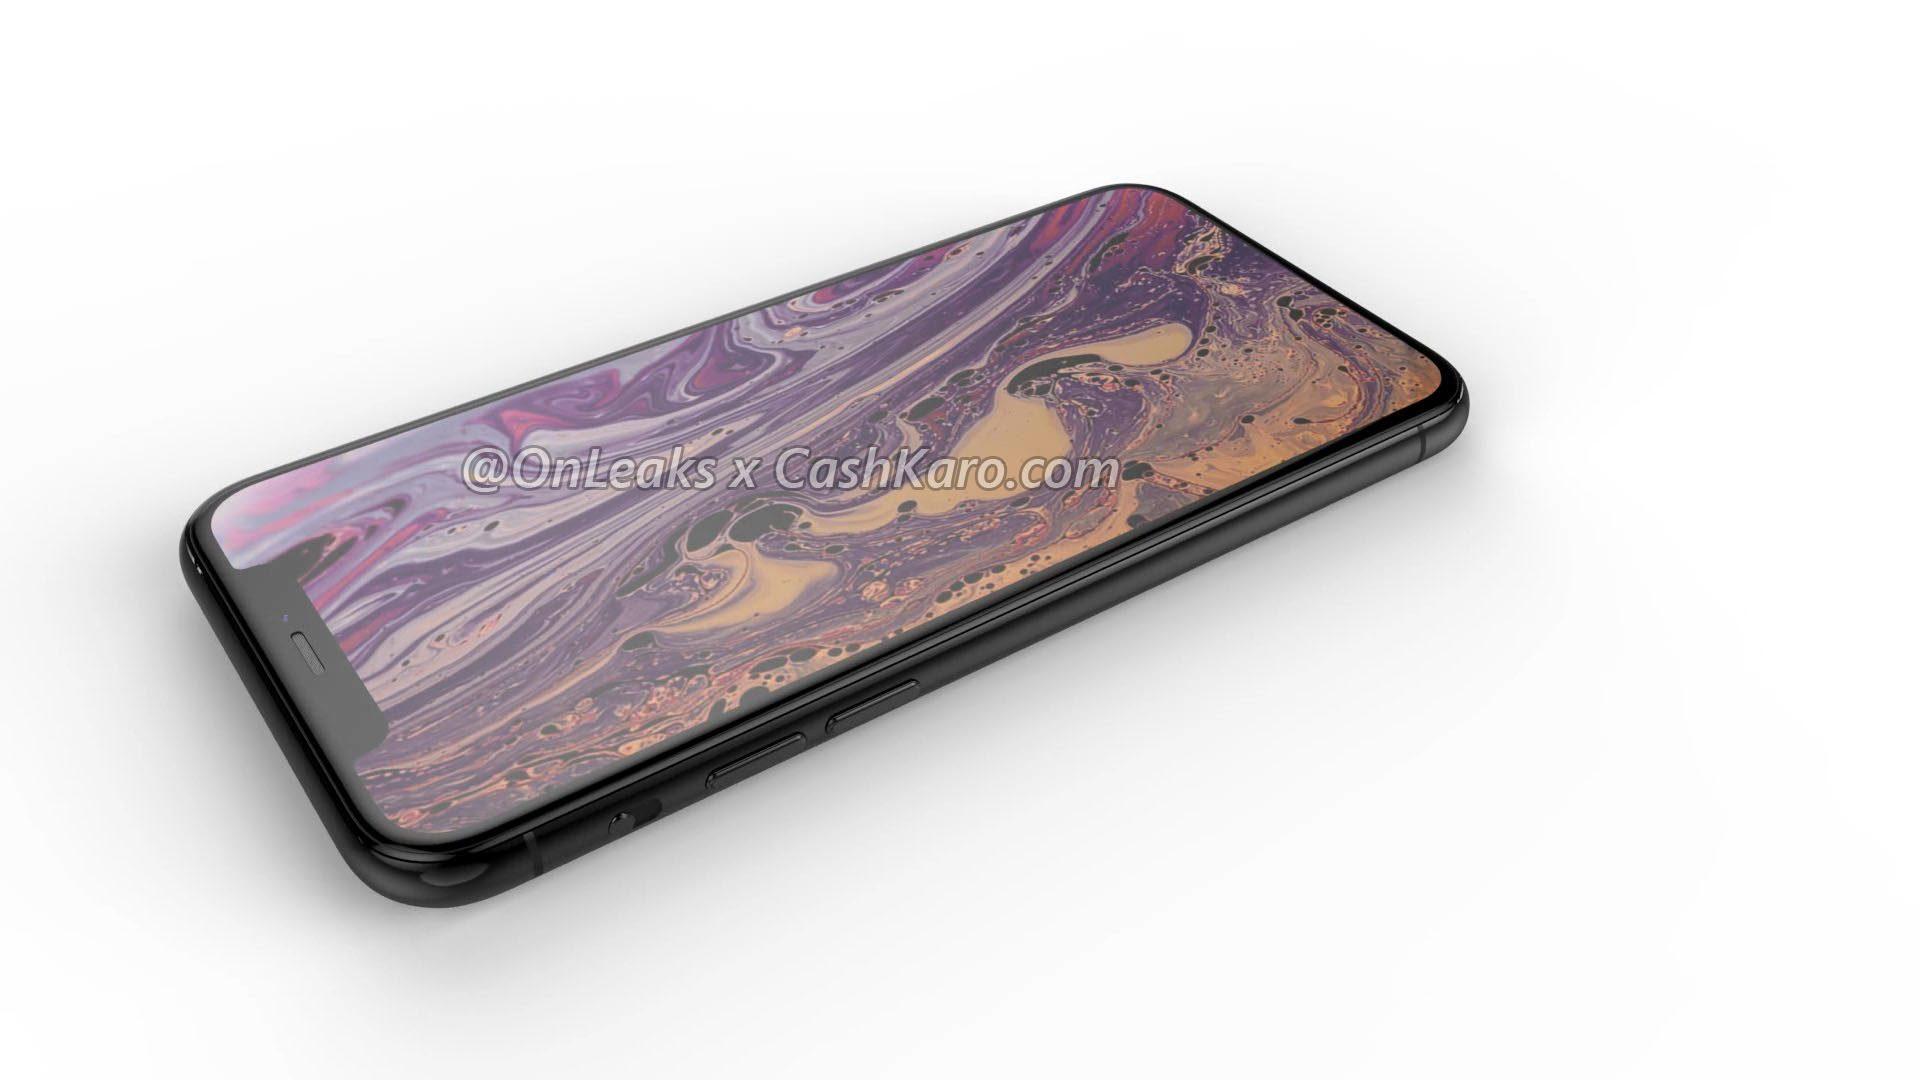 Render of supposed iPhone 2019 by OnLeaks